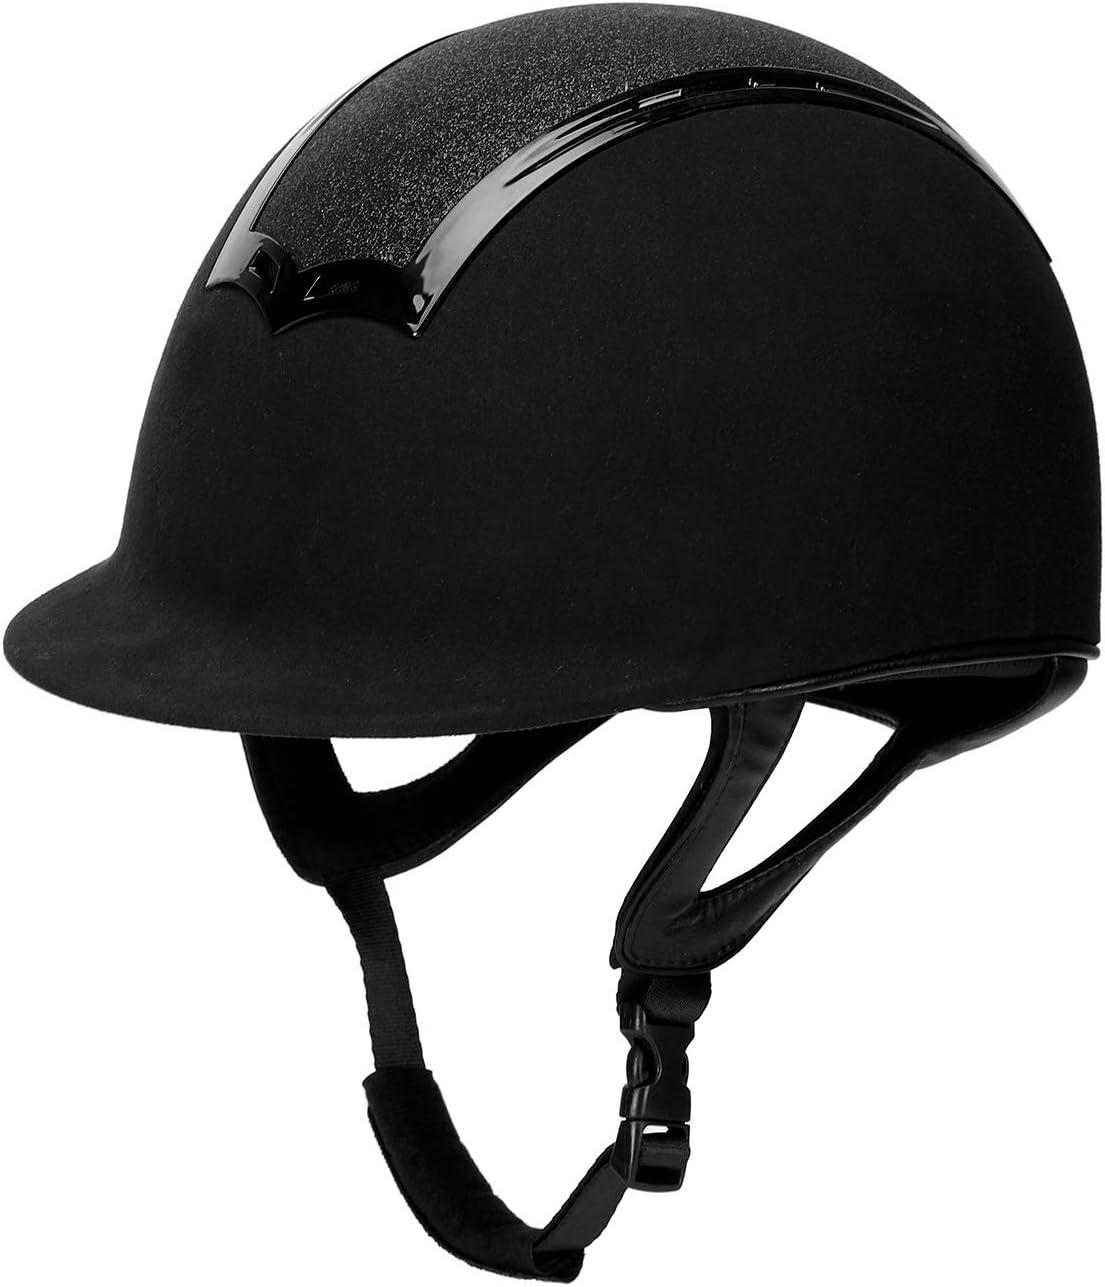 TuffRider Show Time Plus Spasm price Fixed price for sale Helmet